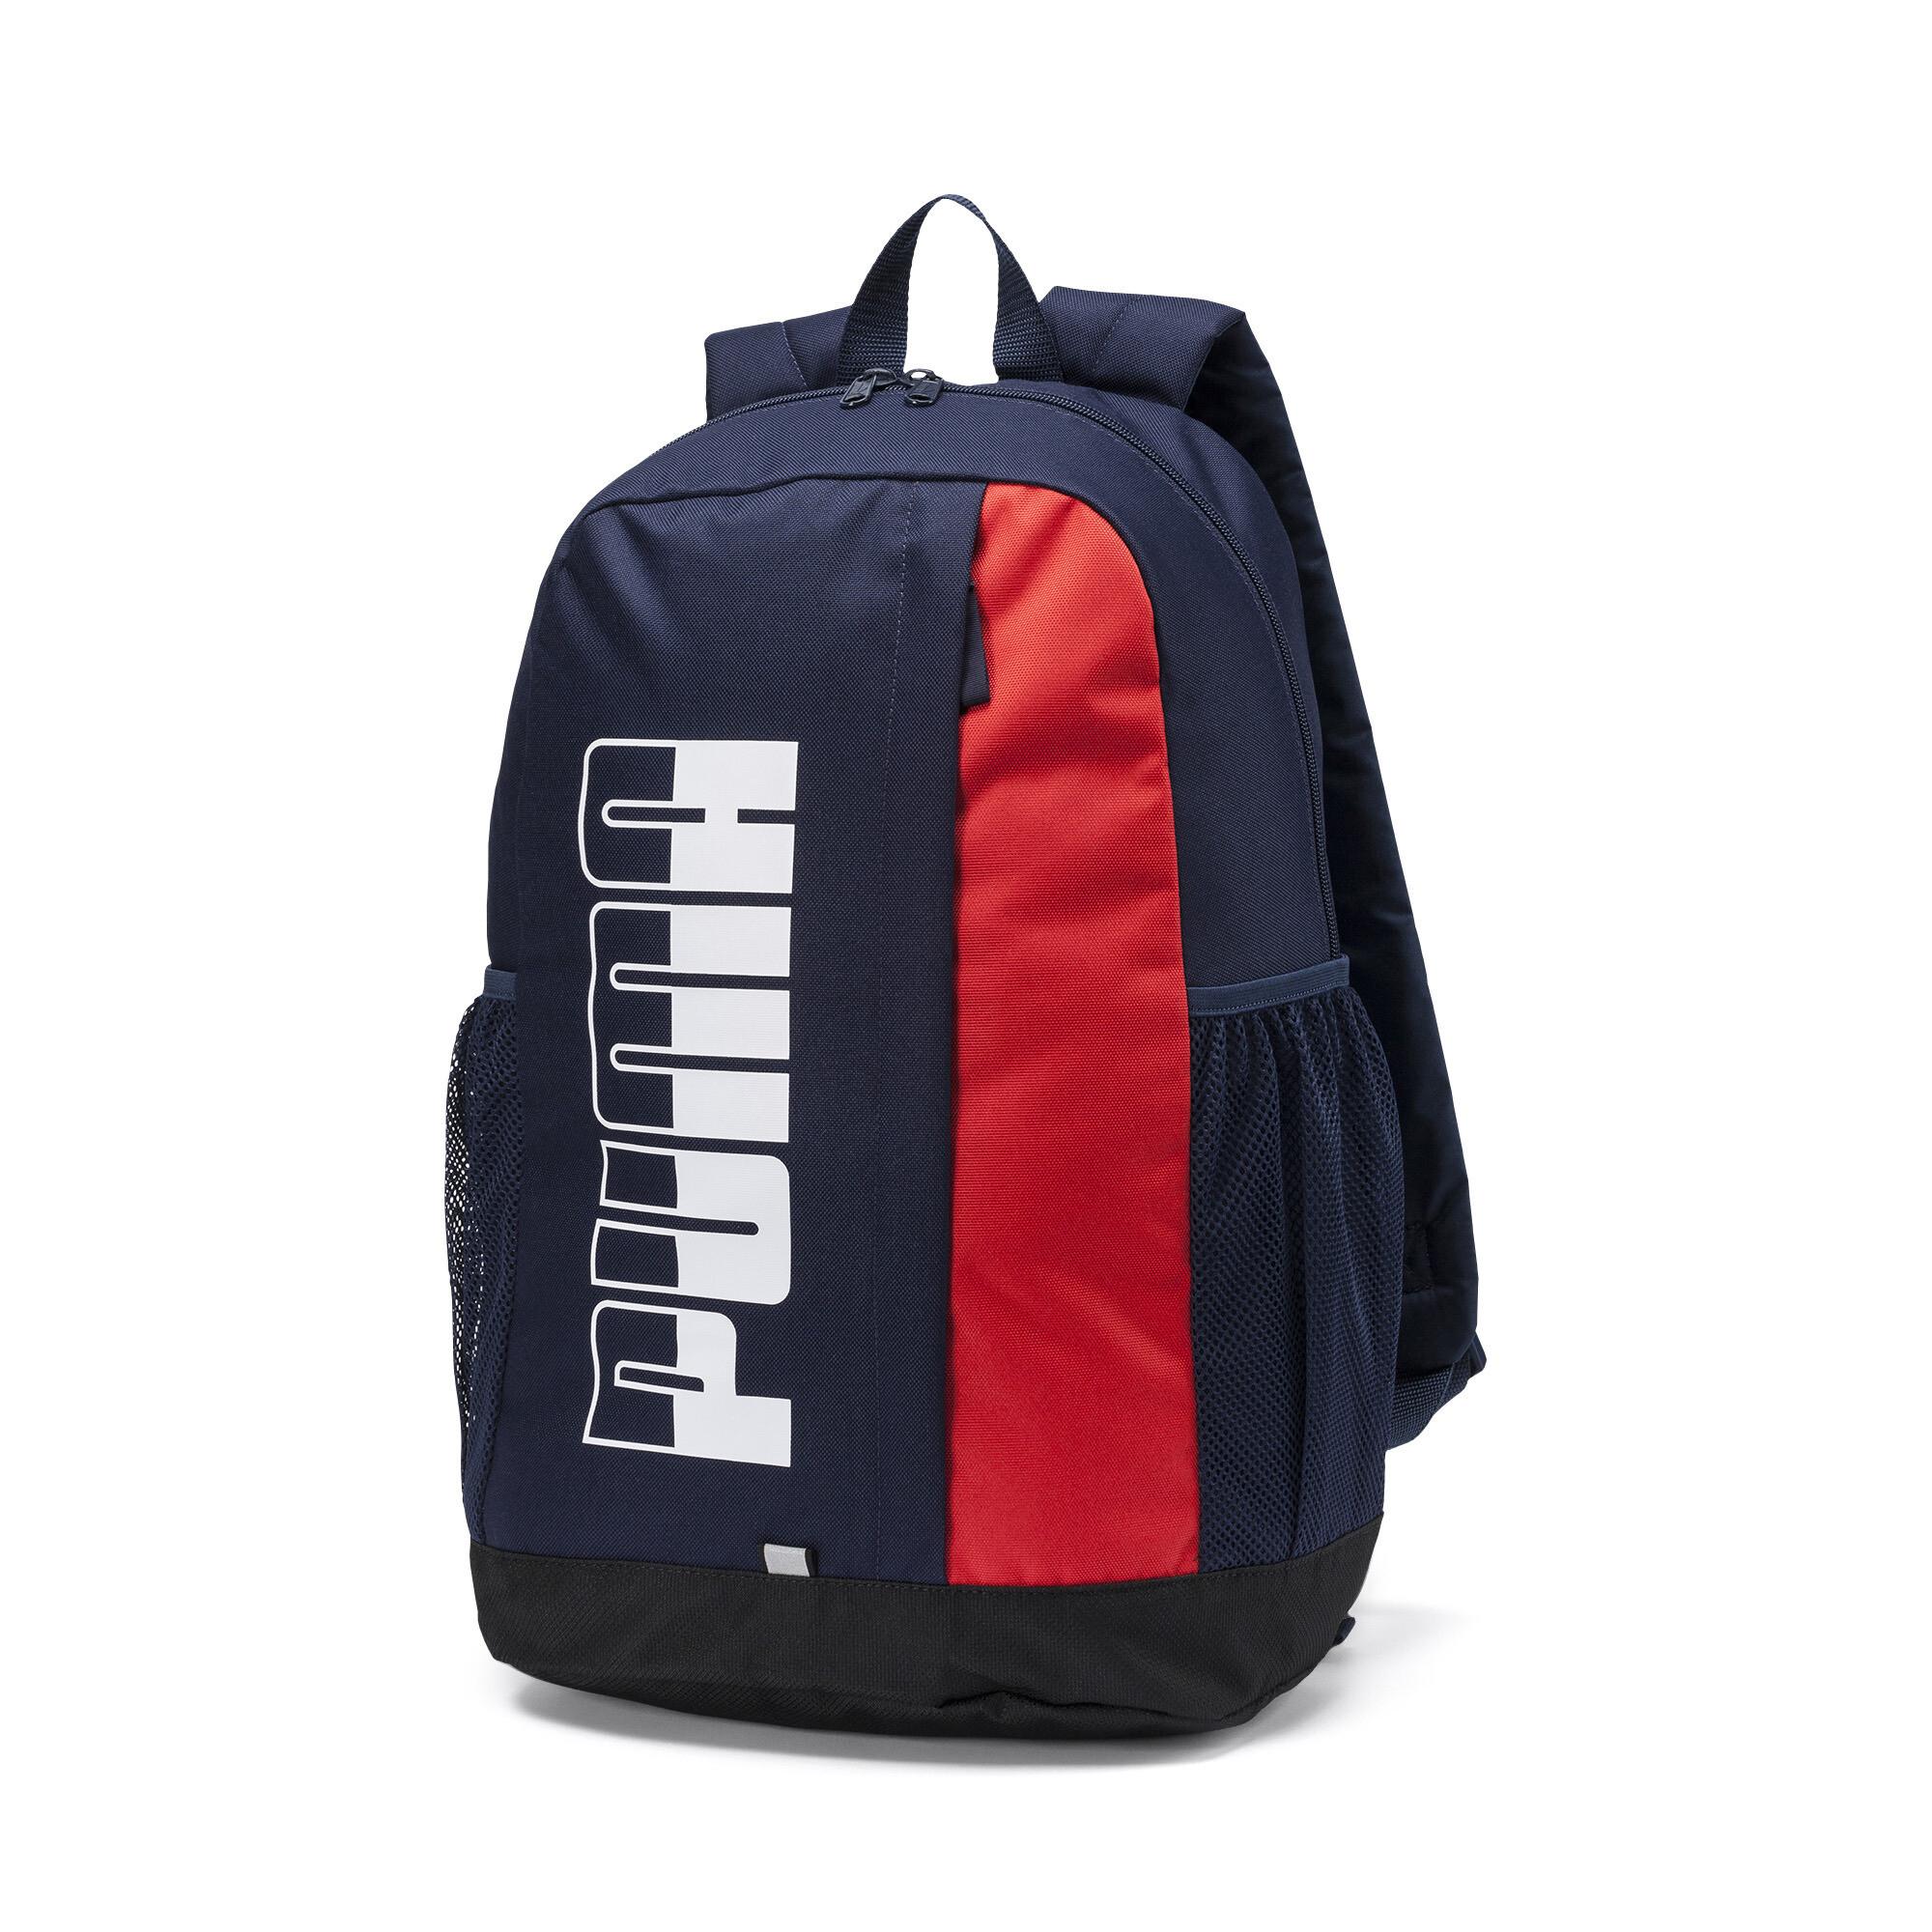 c62021e49a4 Backpacks & Bags - Accessories - Mens